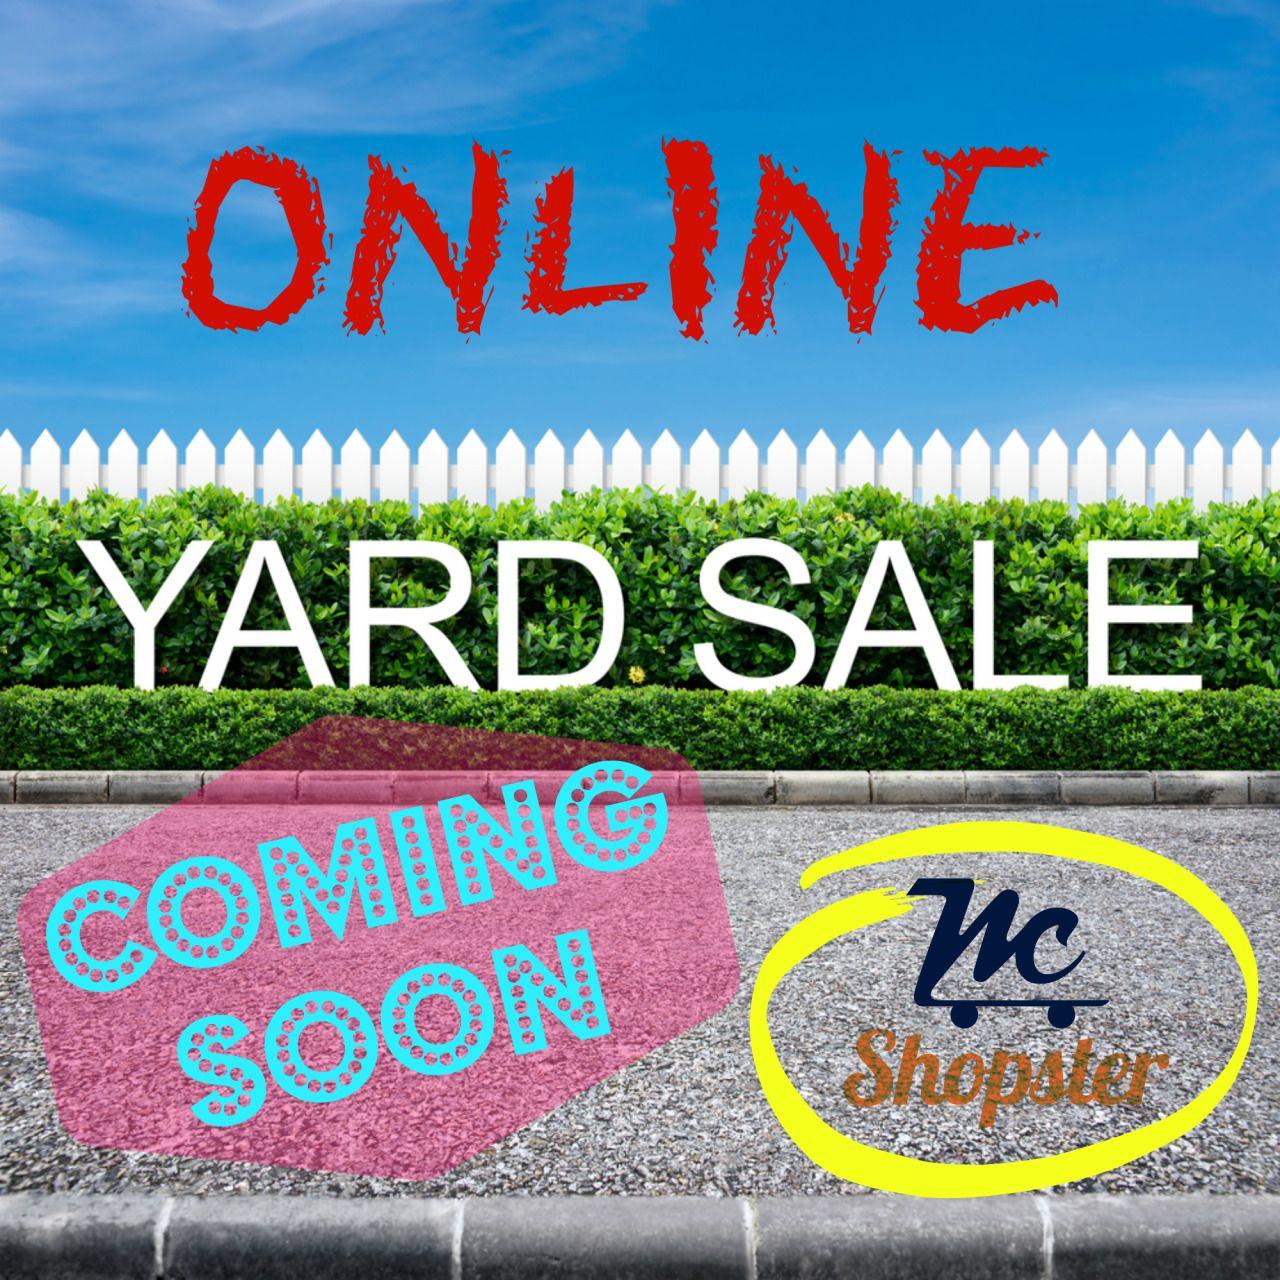 O Y S Online Yard Sale Yardsale Yard Sale Online Yard Sale